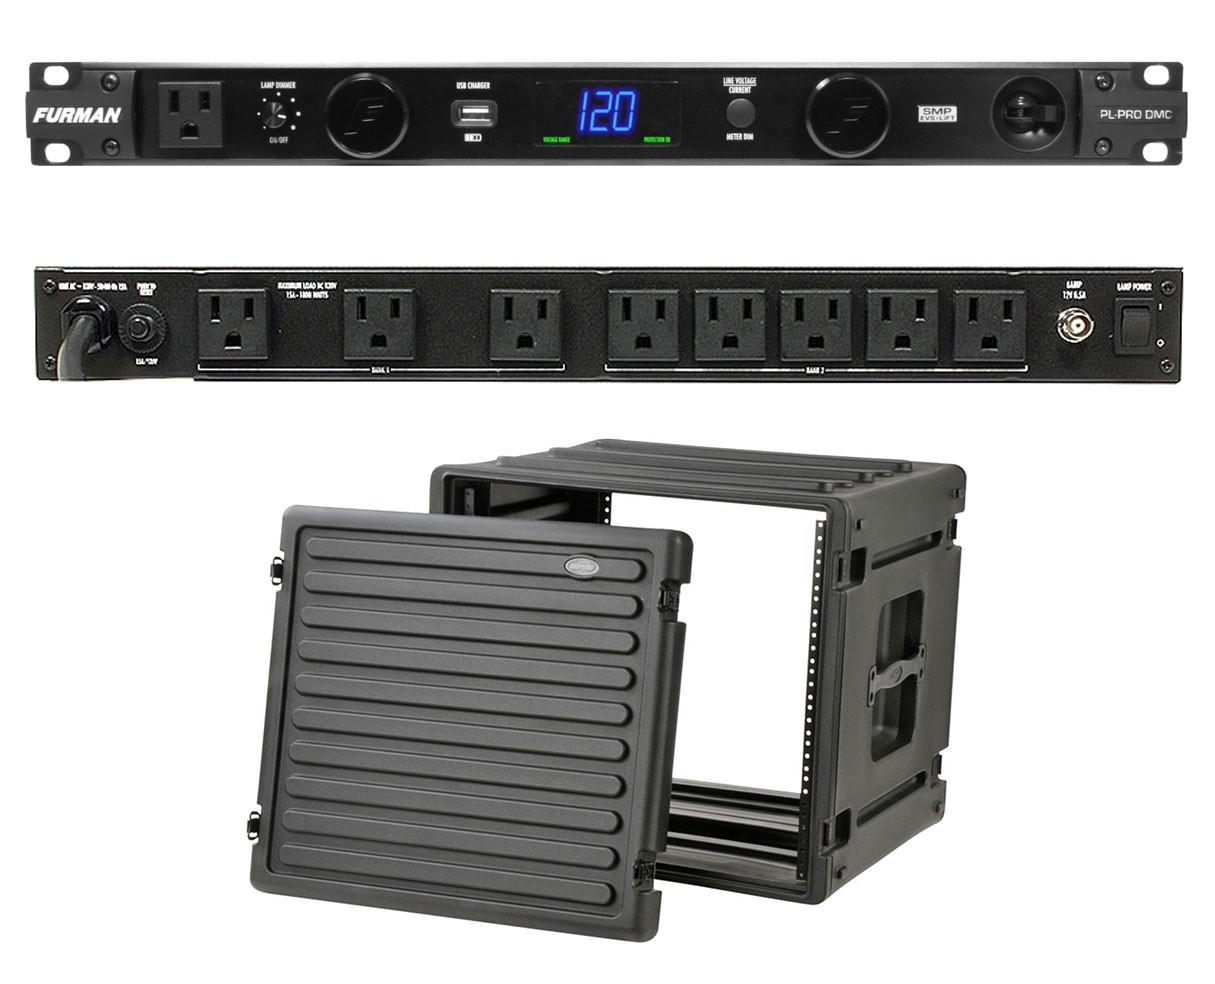 Furman PL-Pro DMC + SKB 1SKB-R10U